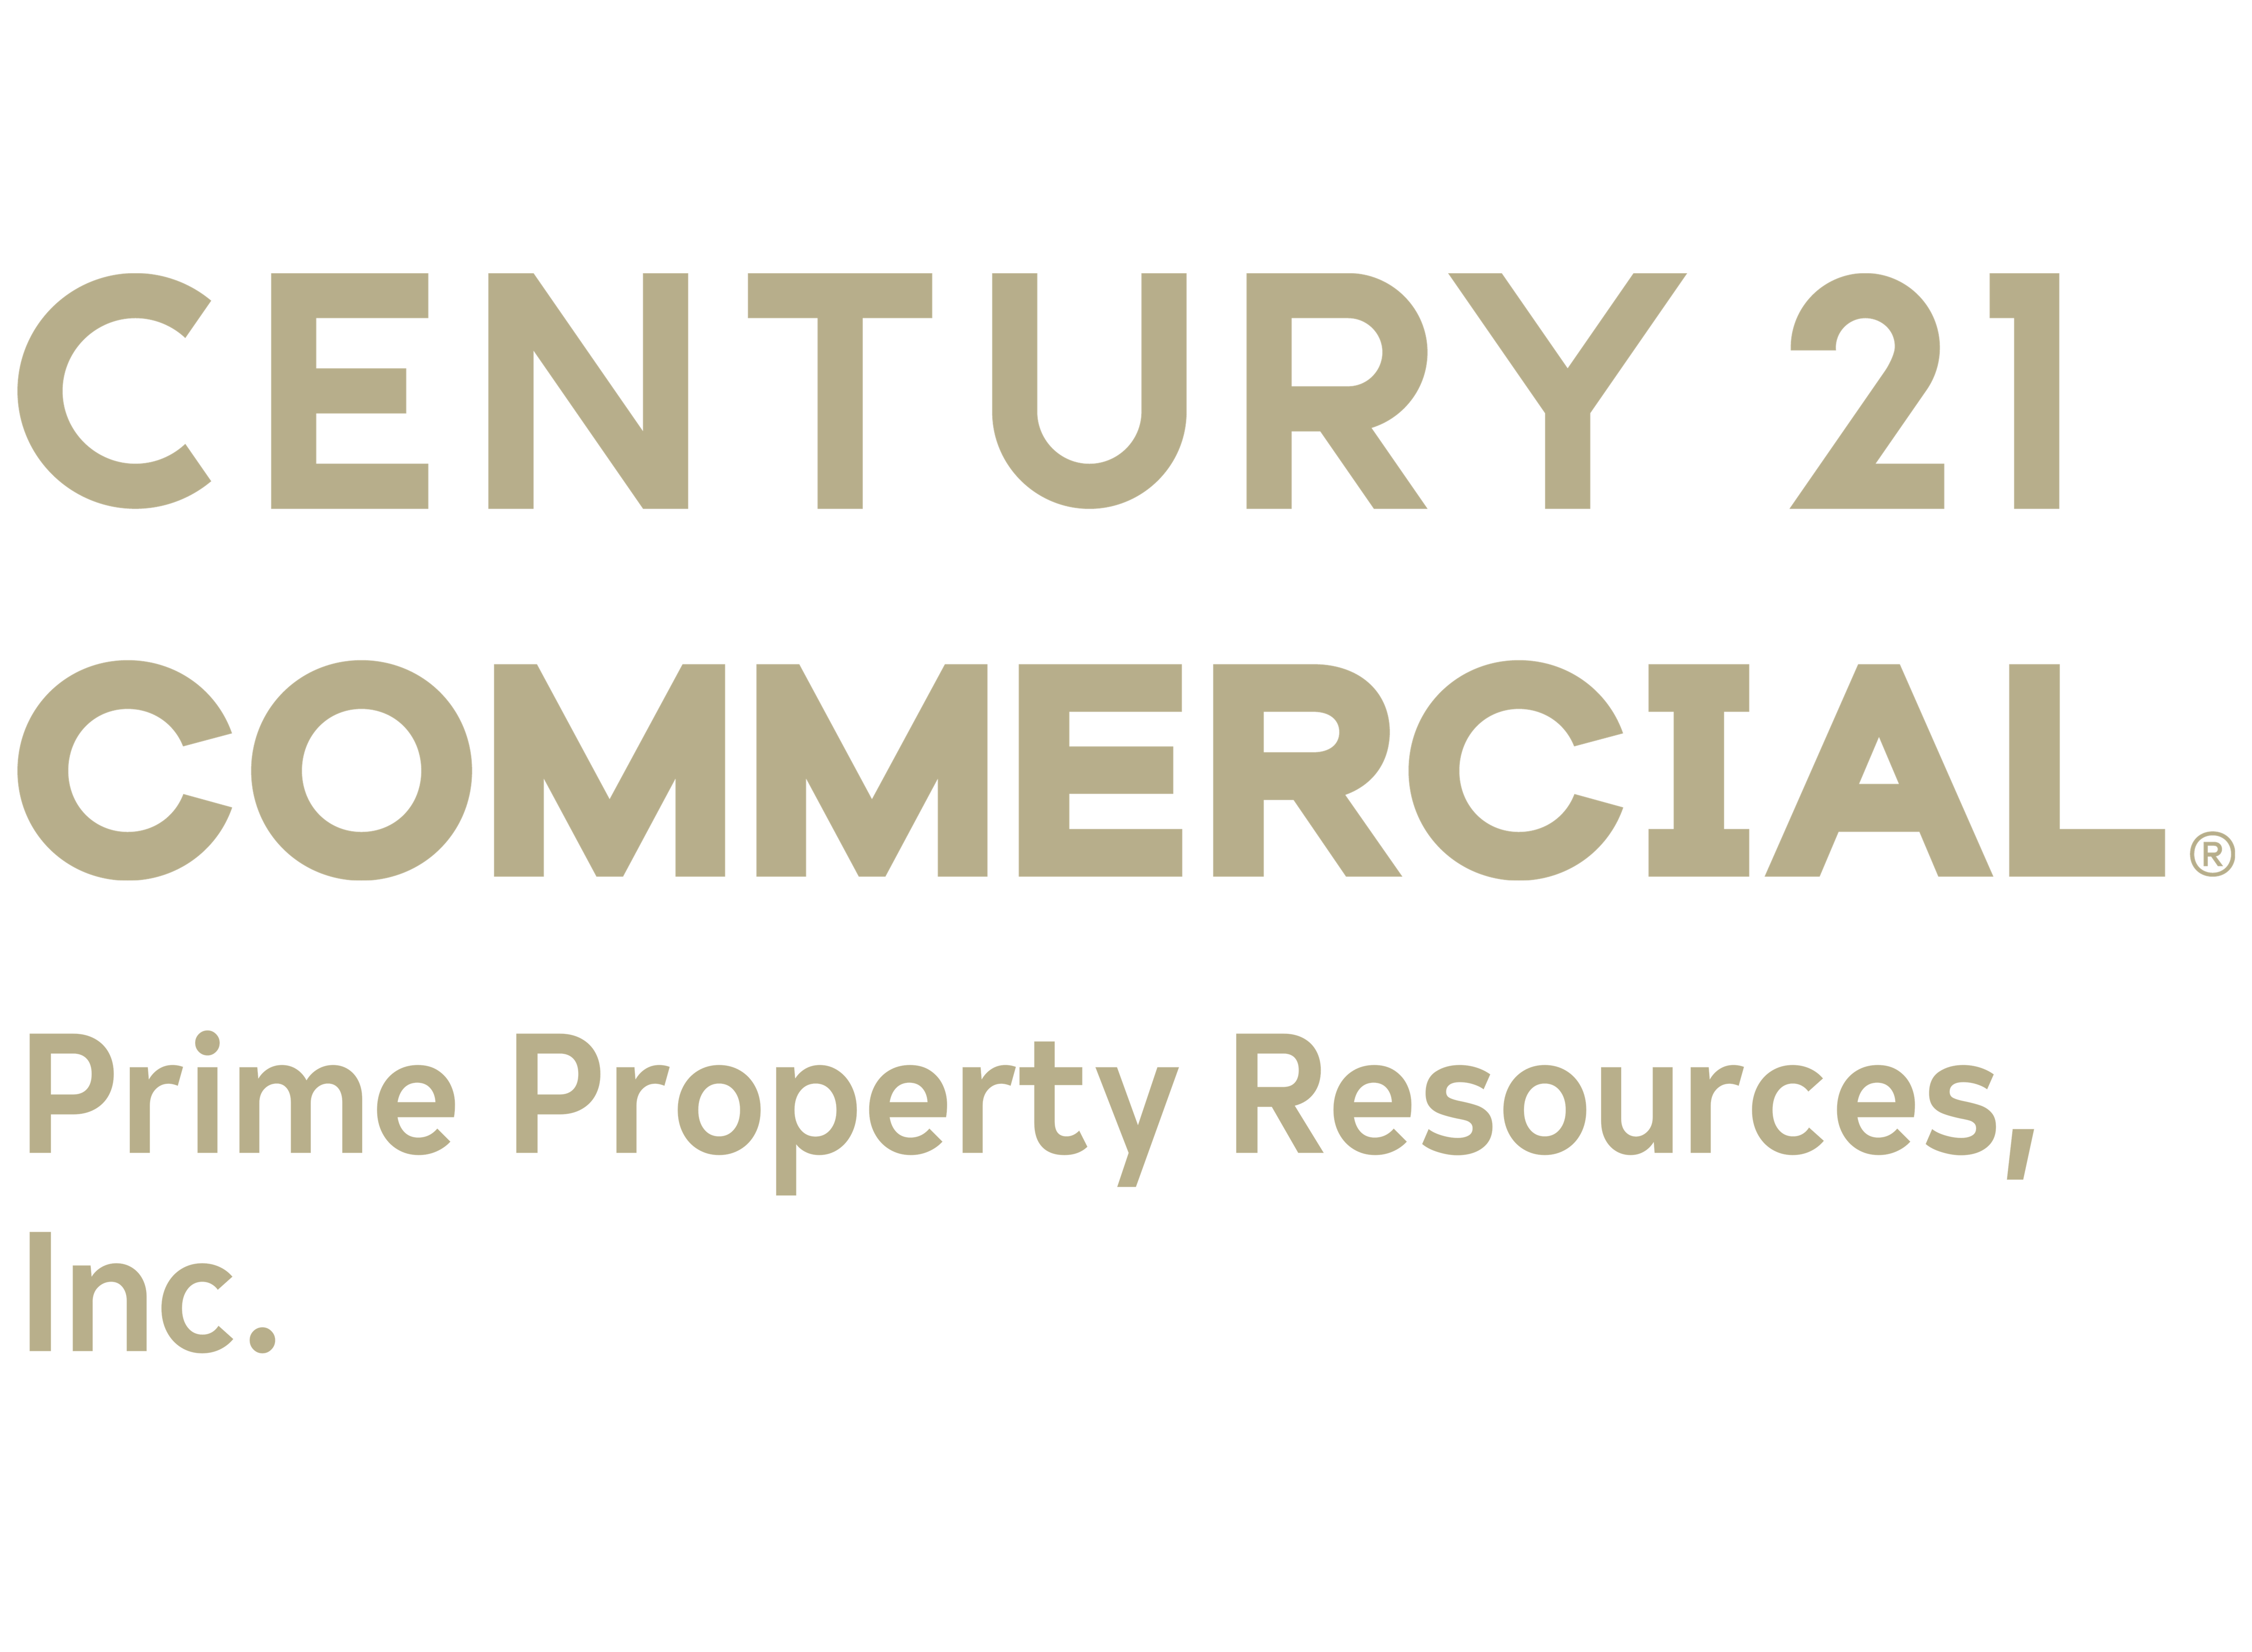 CENTURY 21 Prime Property Resources, Inc.